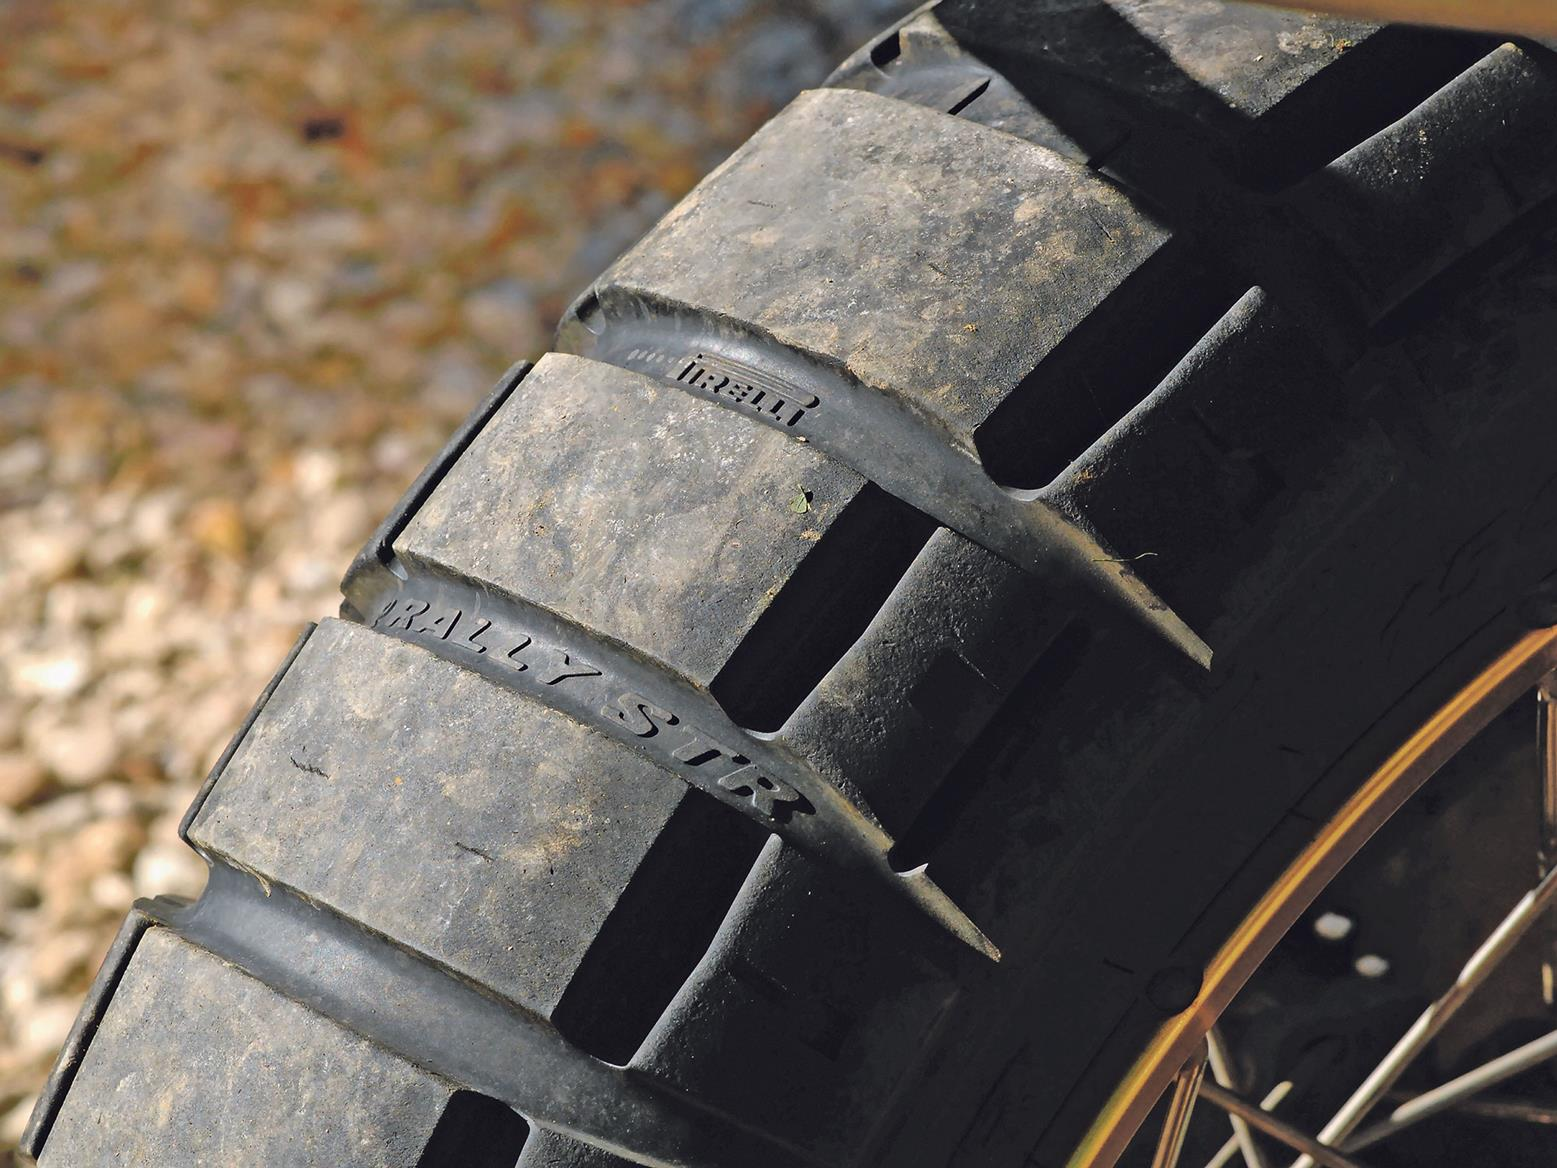 Pirelli Rally STR tyres replace the OE Metzeler Karoo Street